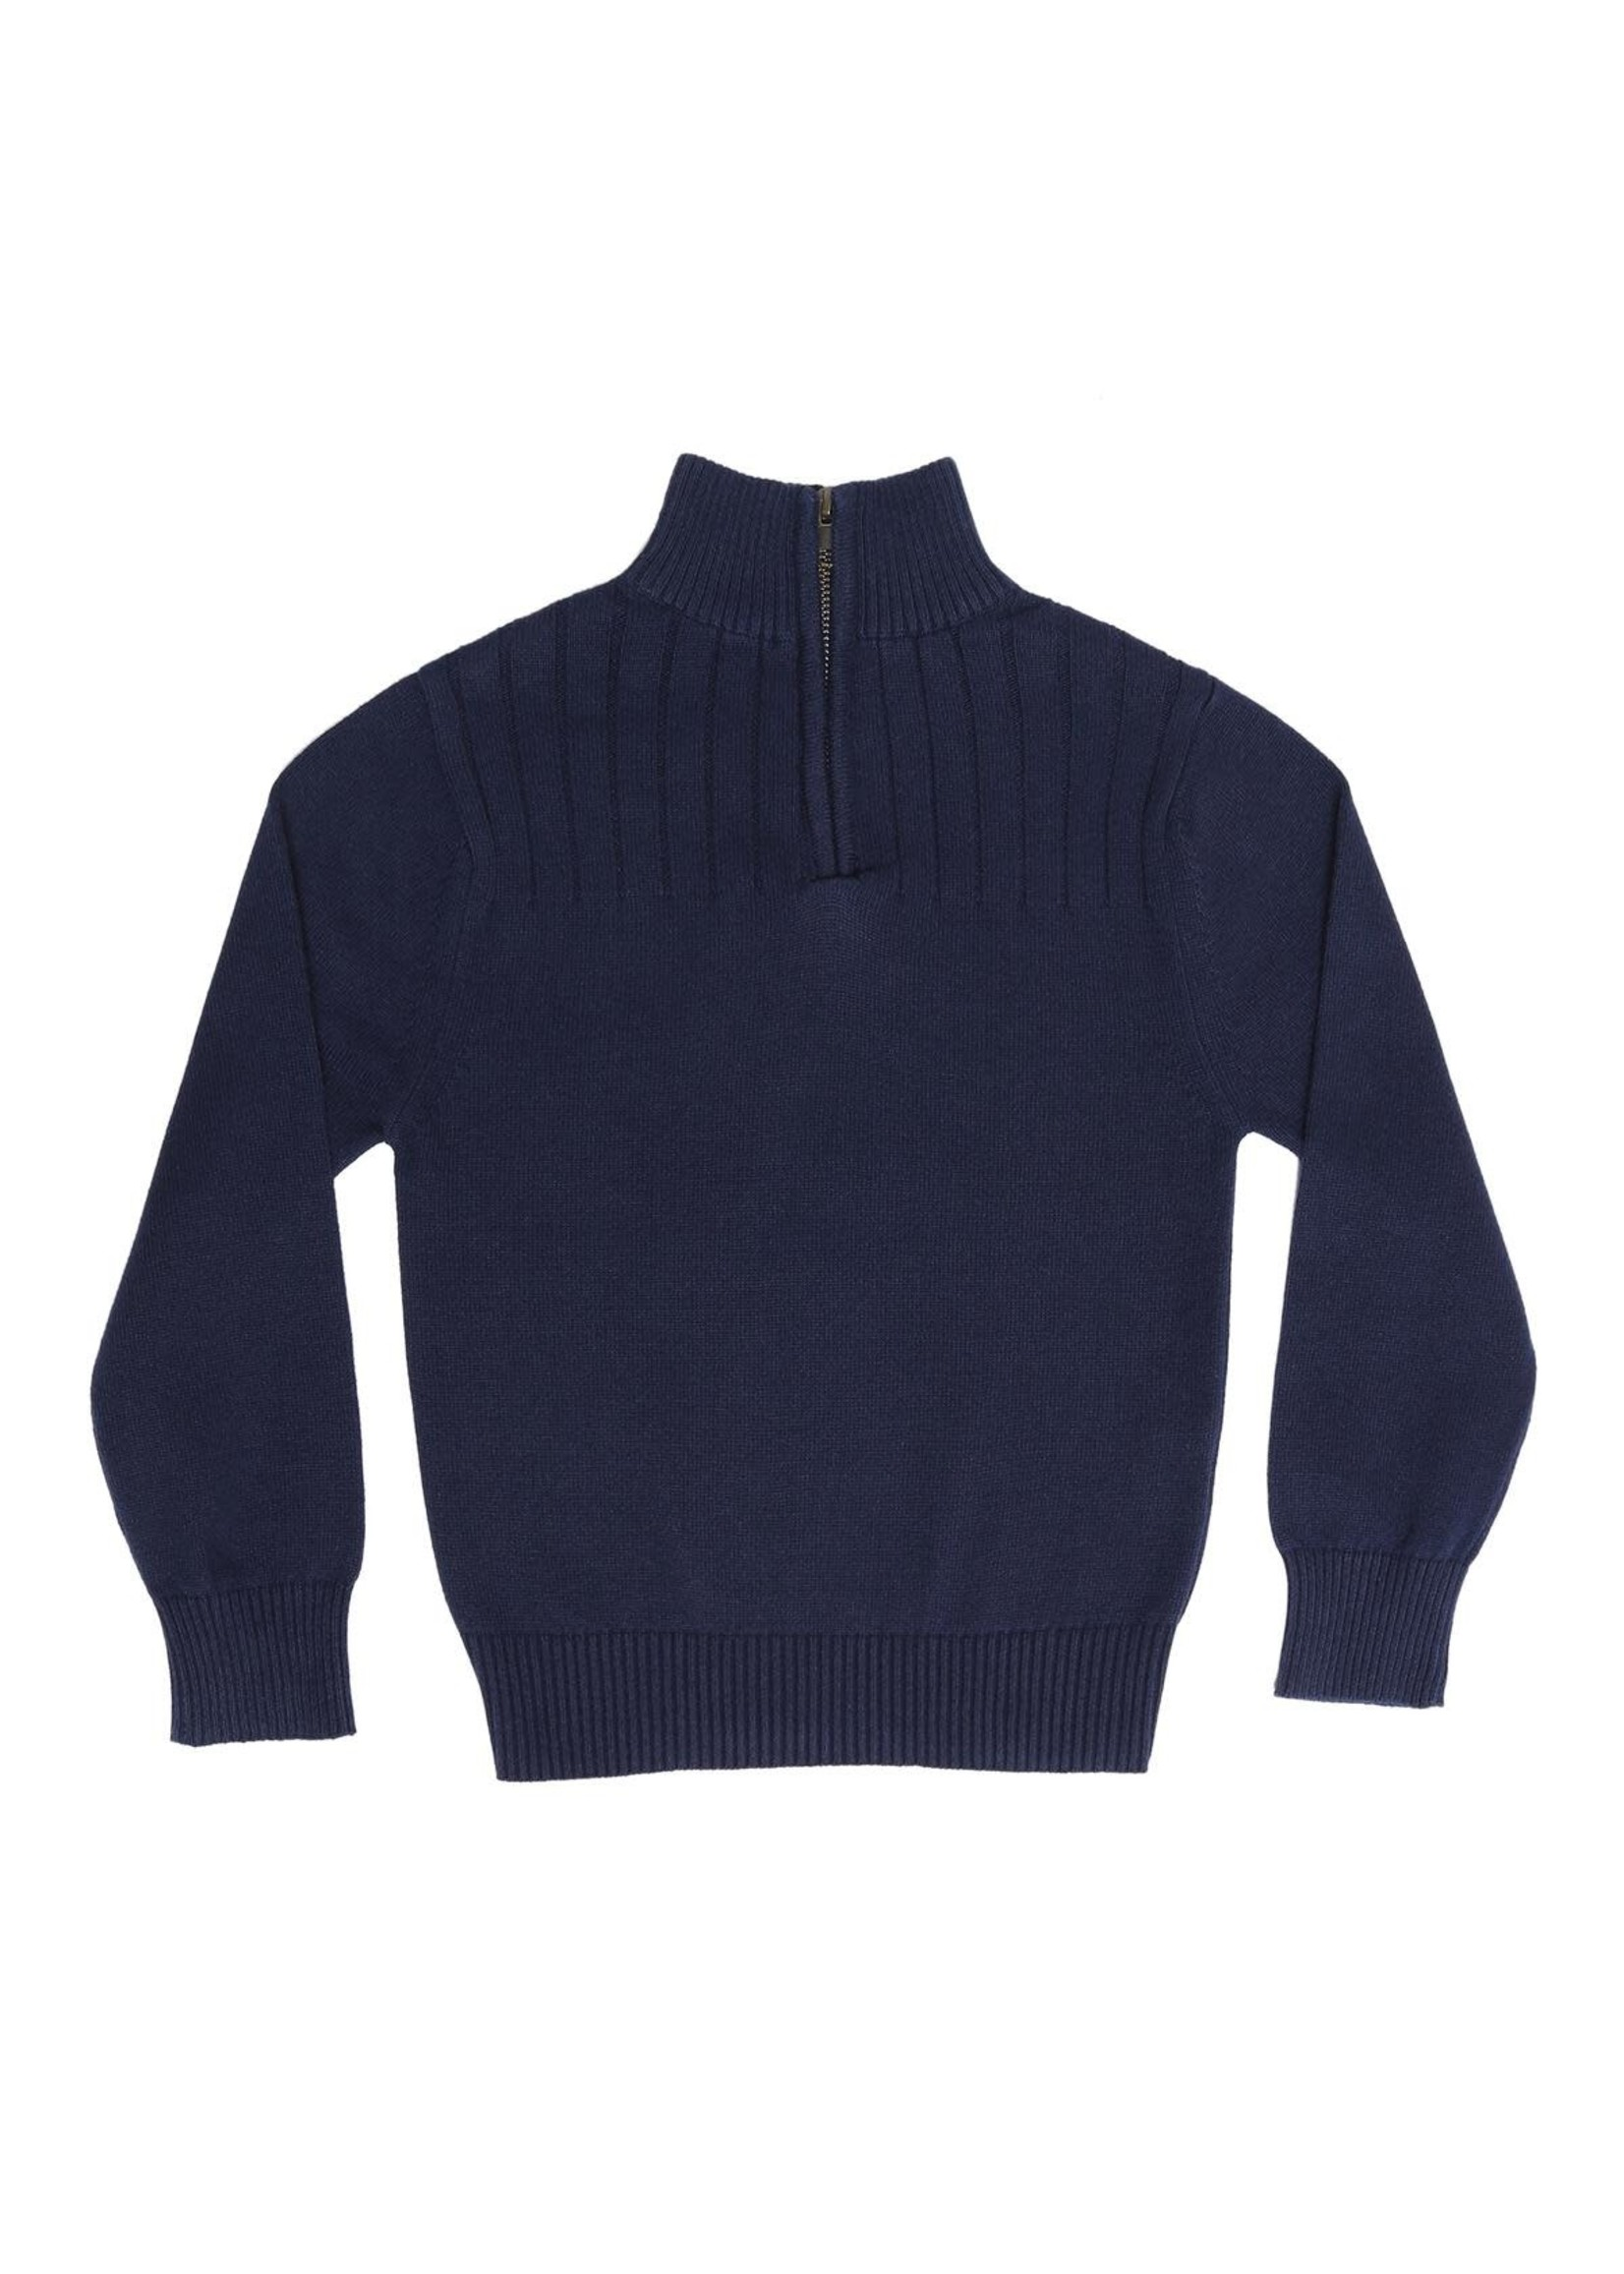 Pedal Pedal navy quarter zip sweater